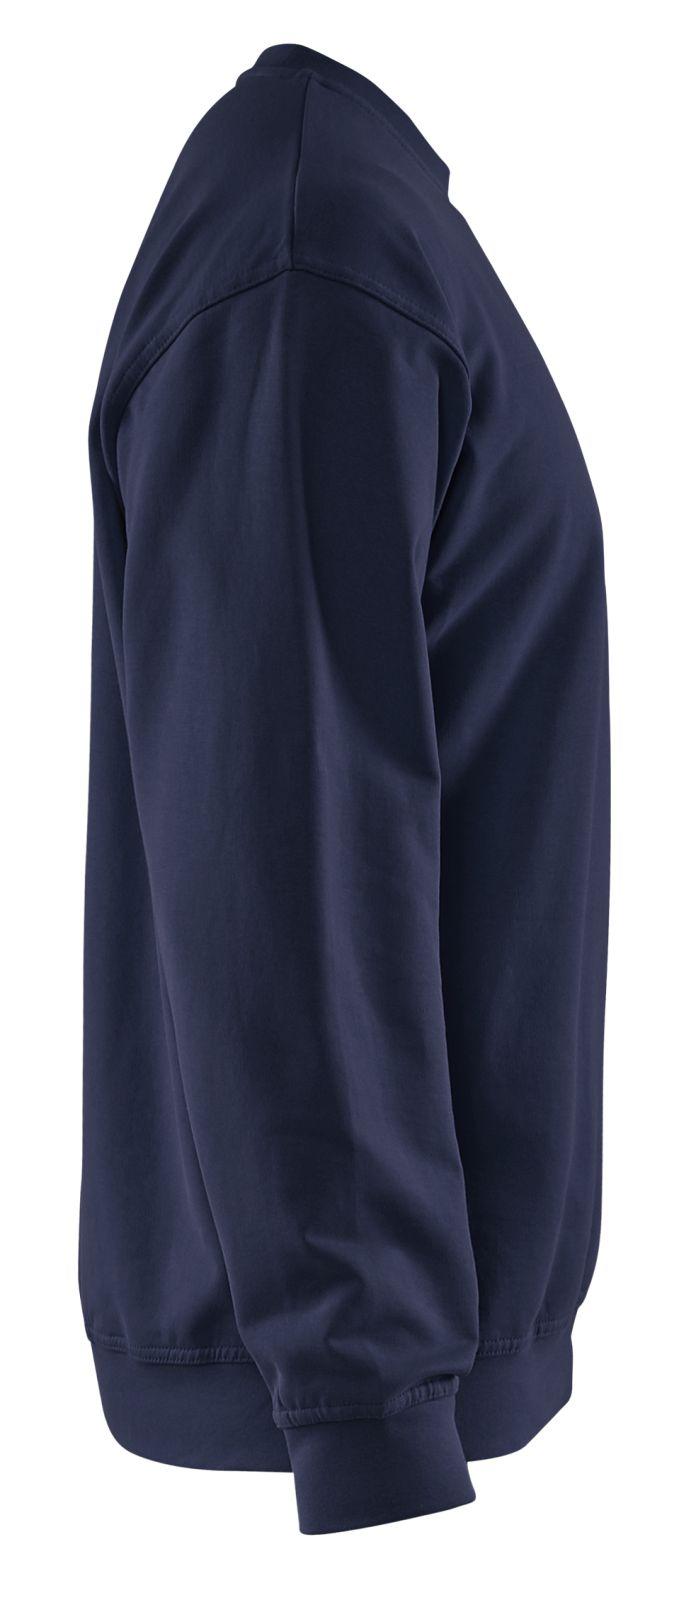 Blaklader Sweatshirts 33401158 marineblauw(8900)